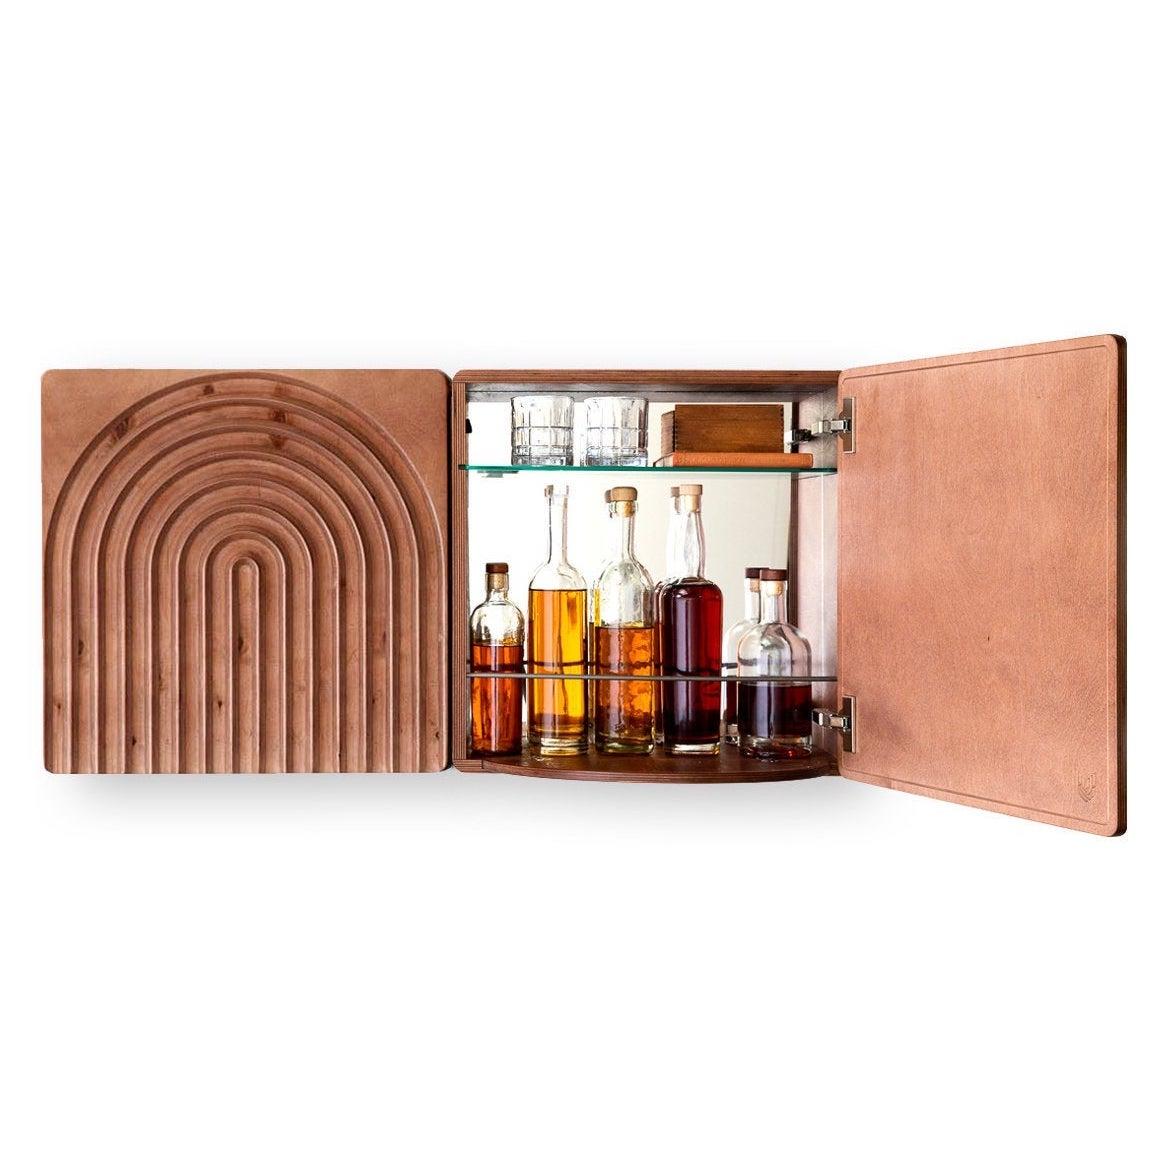 KARVD Arch – Liquor Cabinet